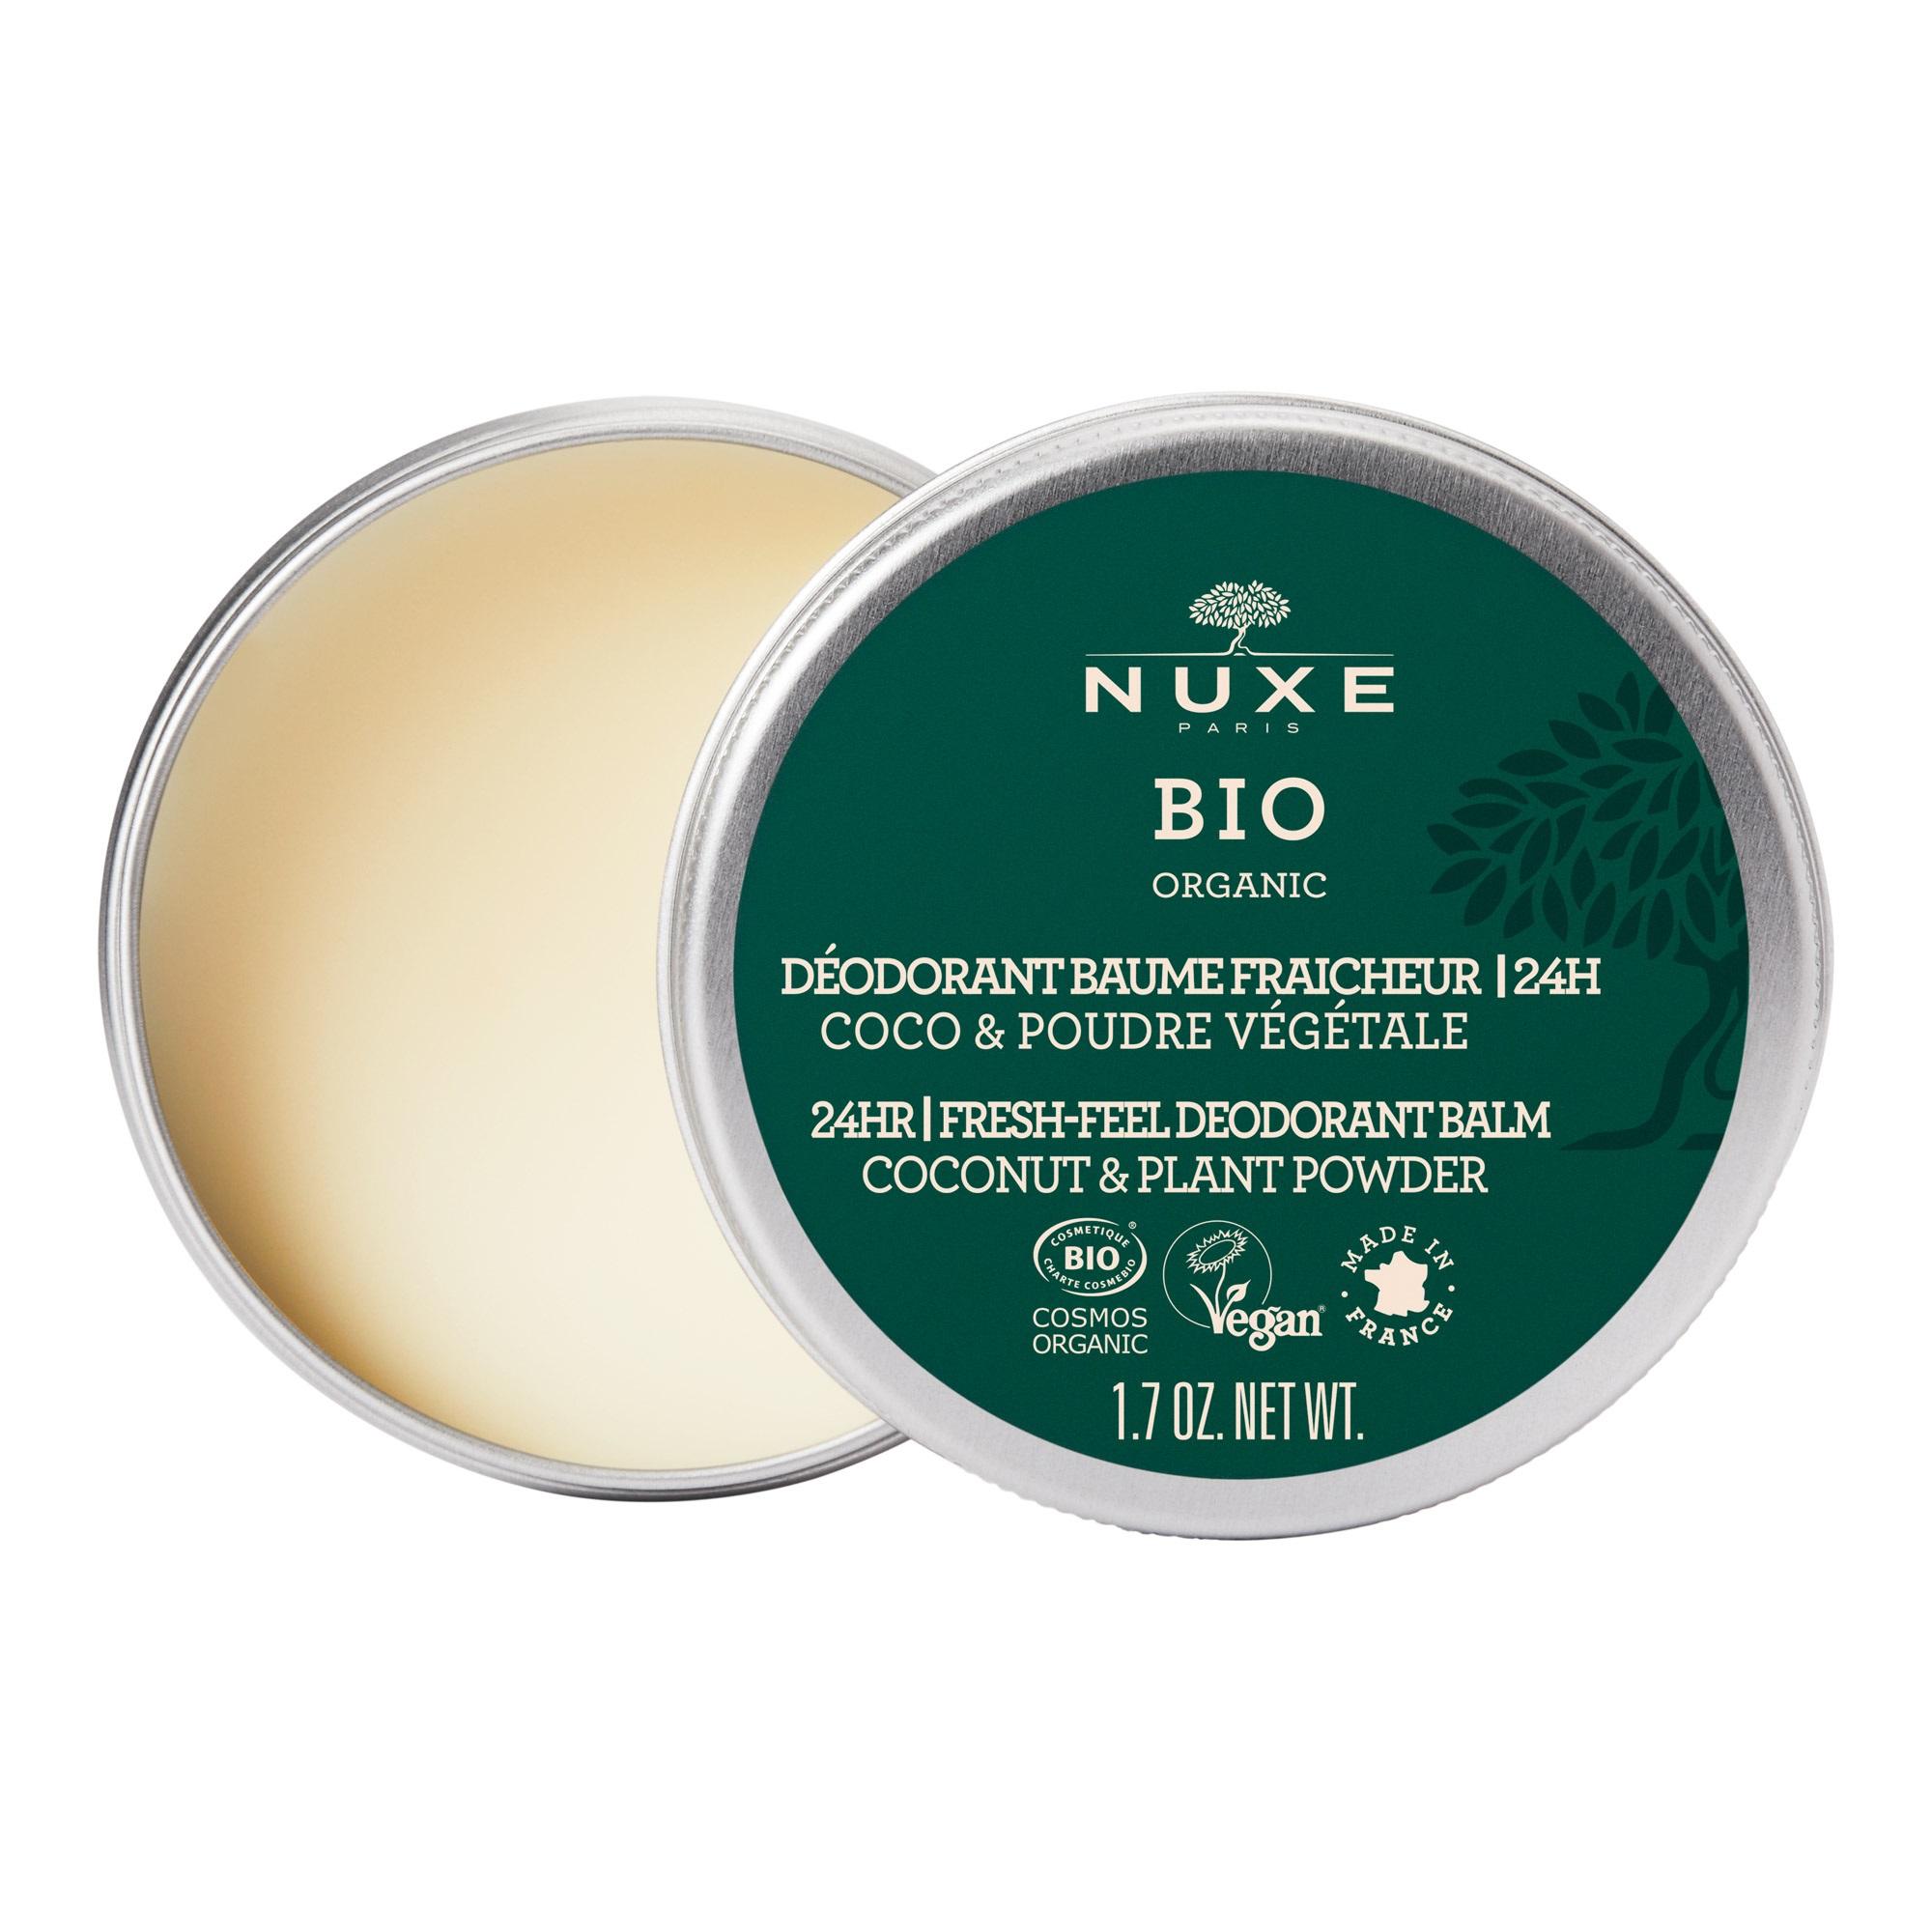 Image of Nuxe Bio Déodorant baume fraicheur